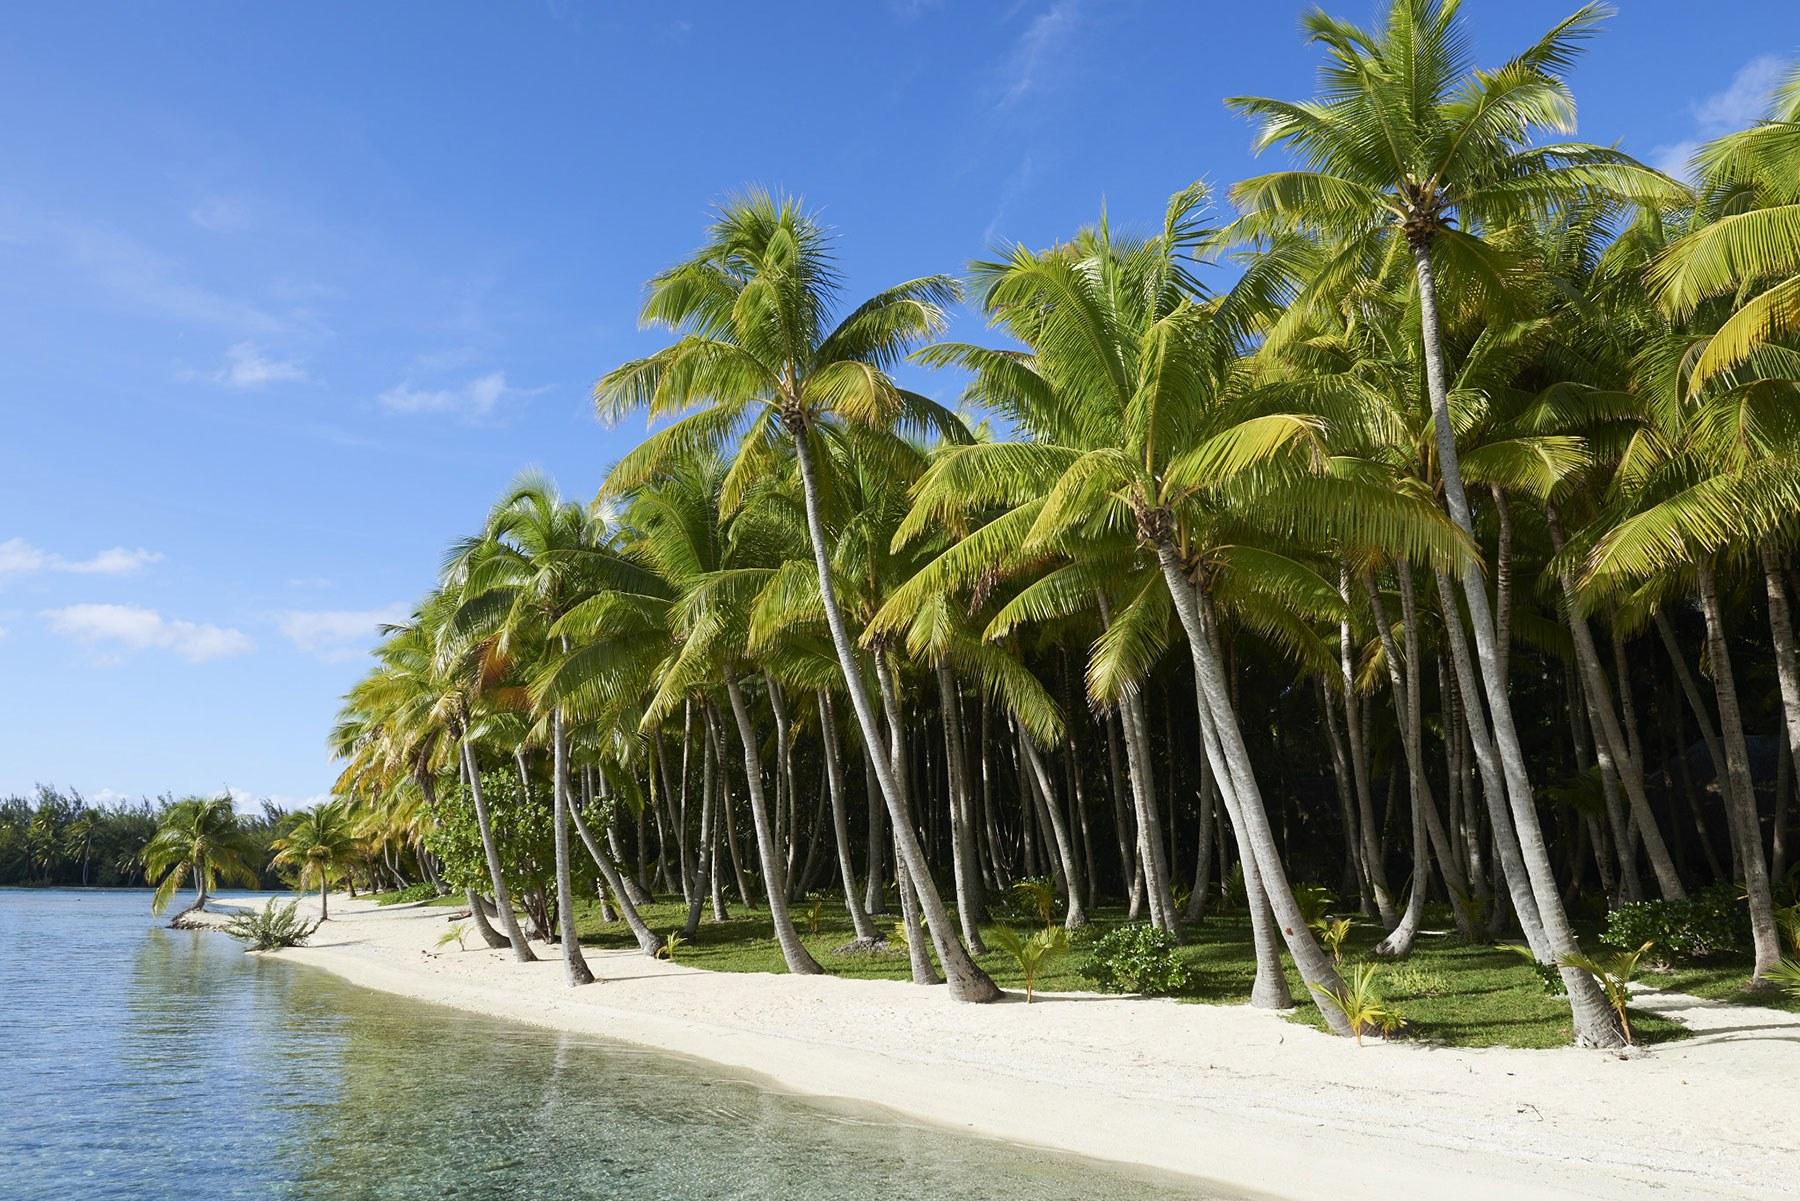 2-francois-nars-coloca-ilha-paradisiaca-na-costa-de-bora-bora-a-venda